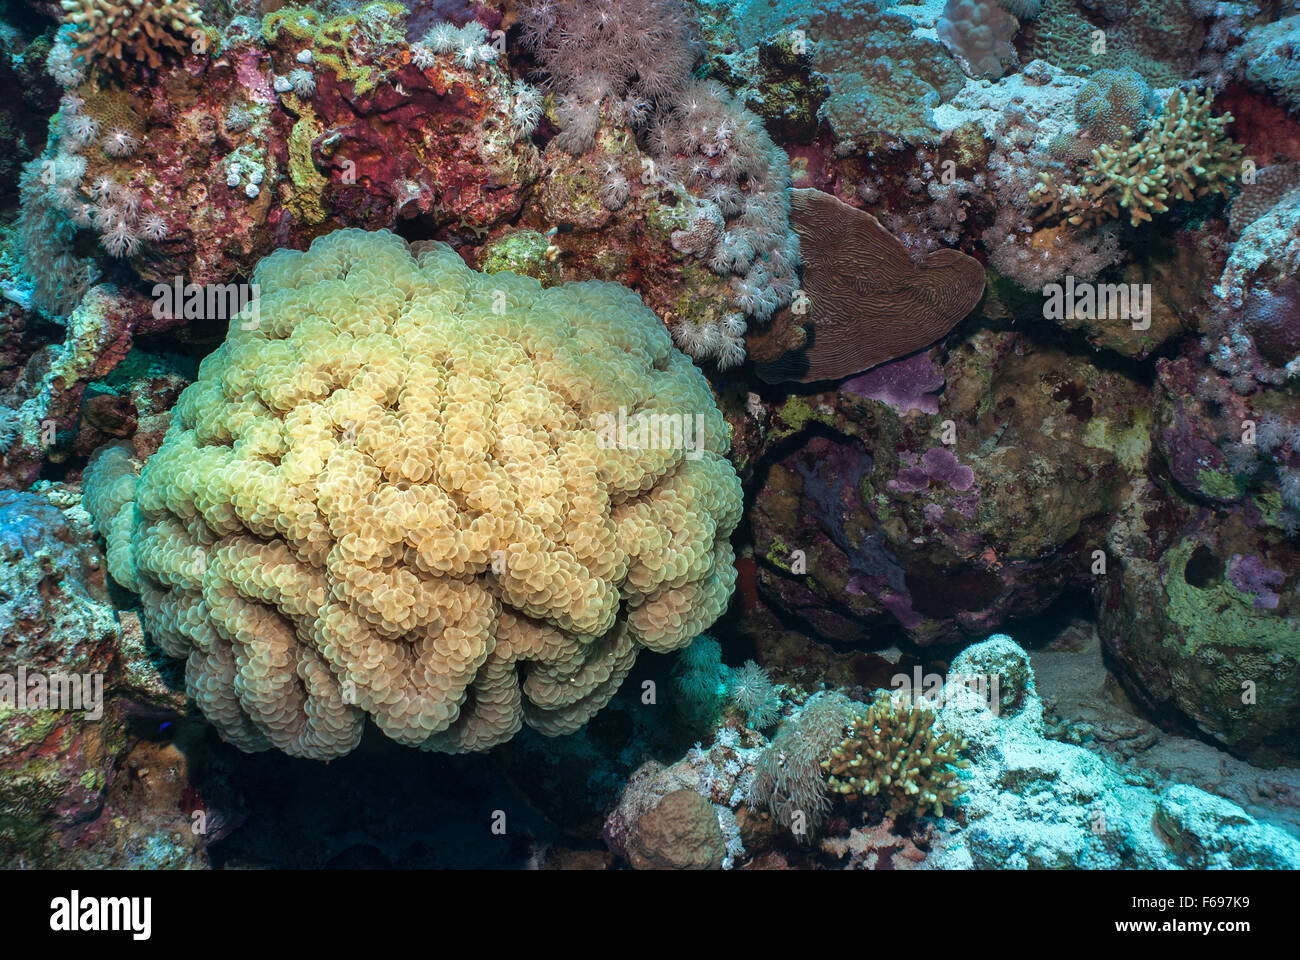 Bubble coral, Plerogyra sinuosa, Caryophylliidae, Sharm el Sheikh, Red Sea, Egypt - Stock Image